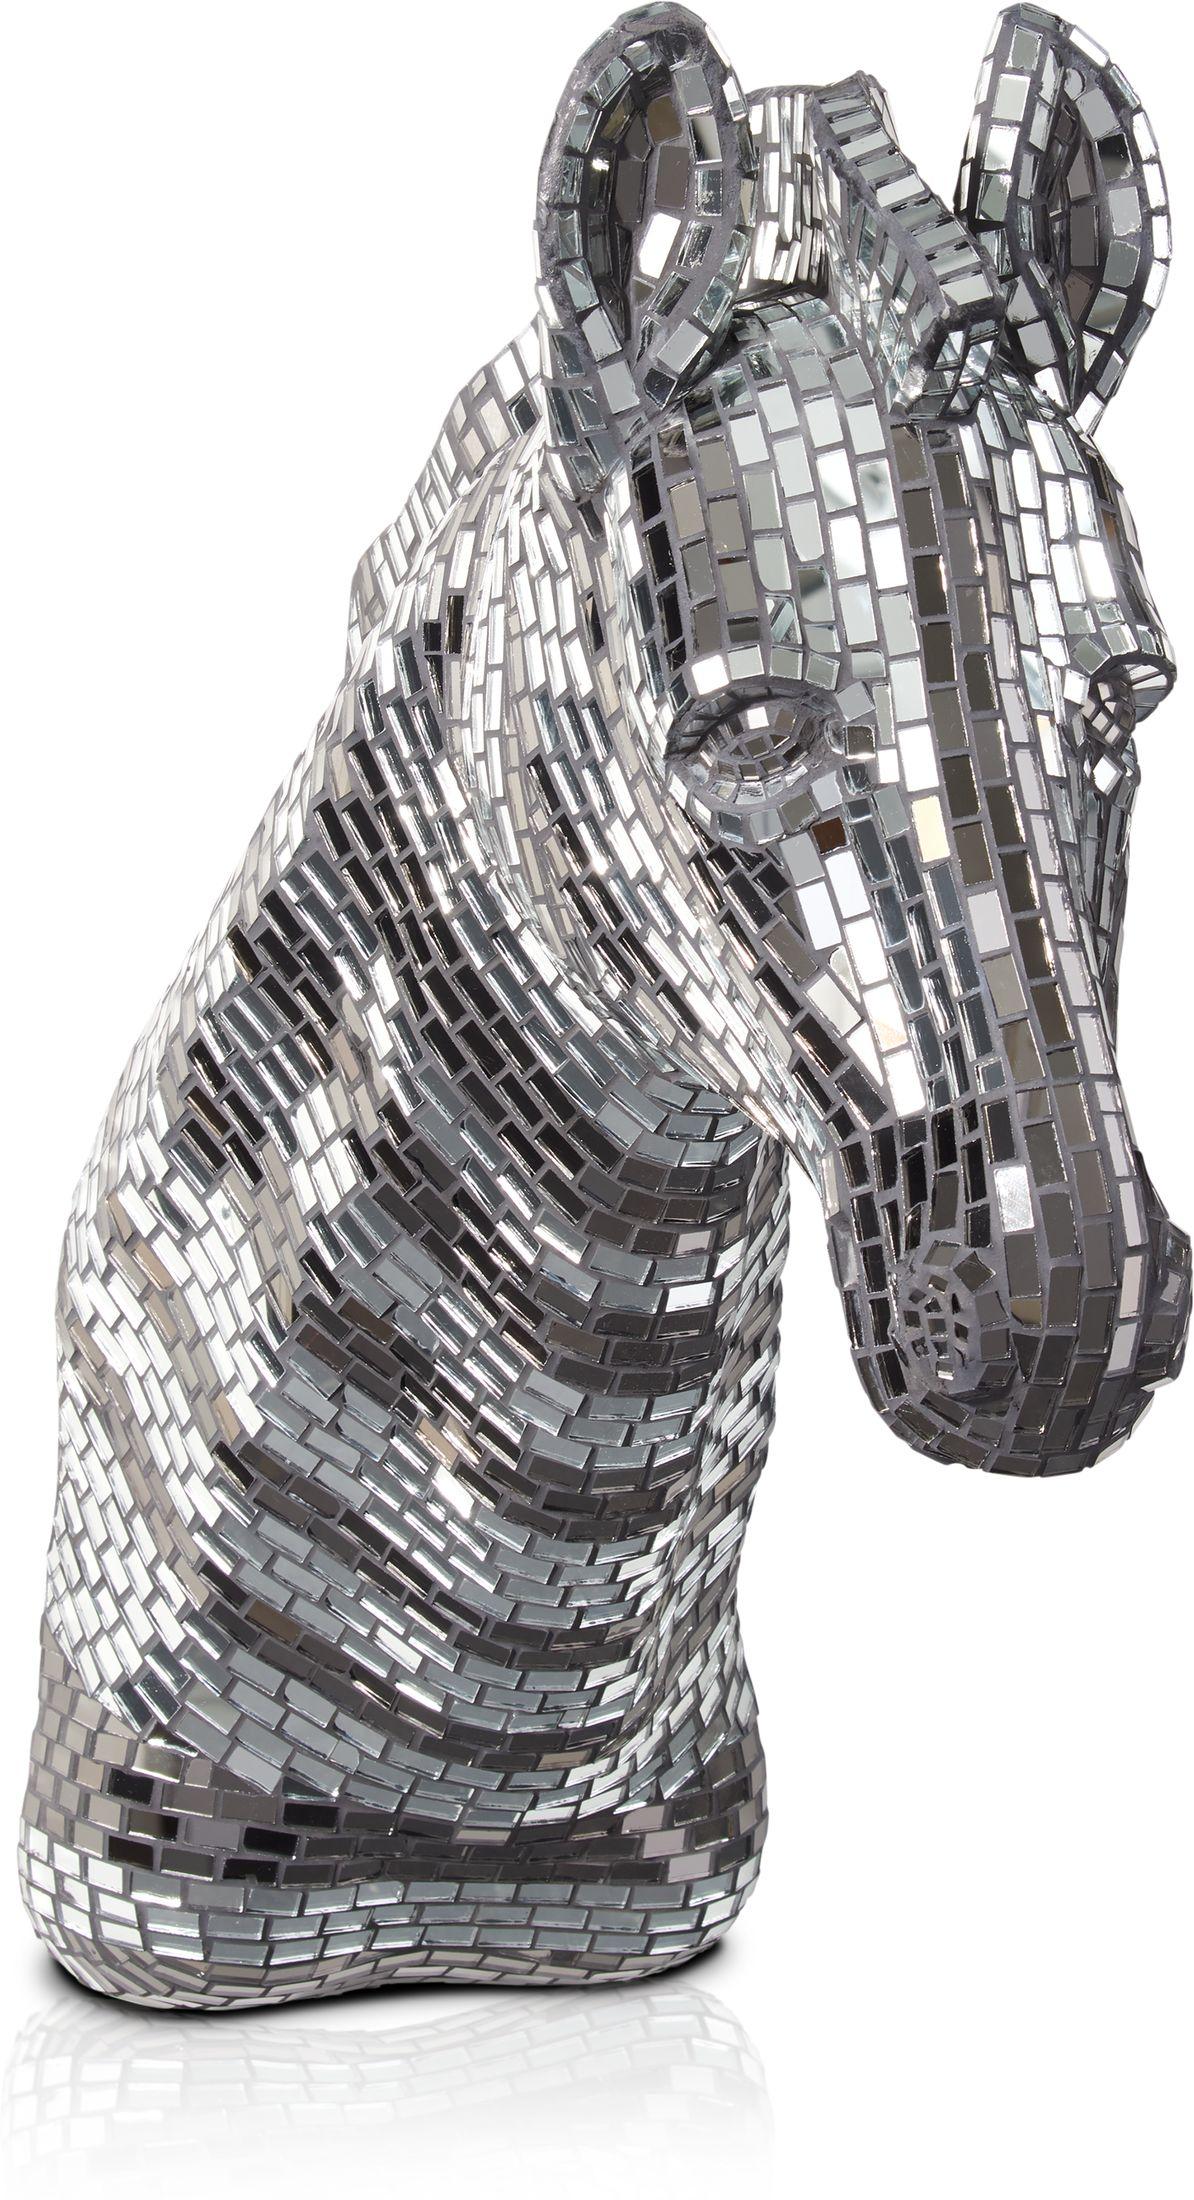 Home Accessories - Zebra Head Wall Art